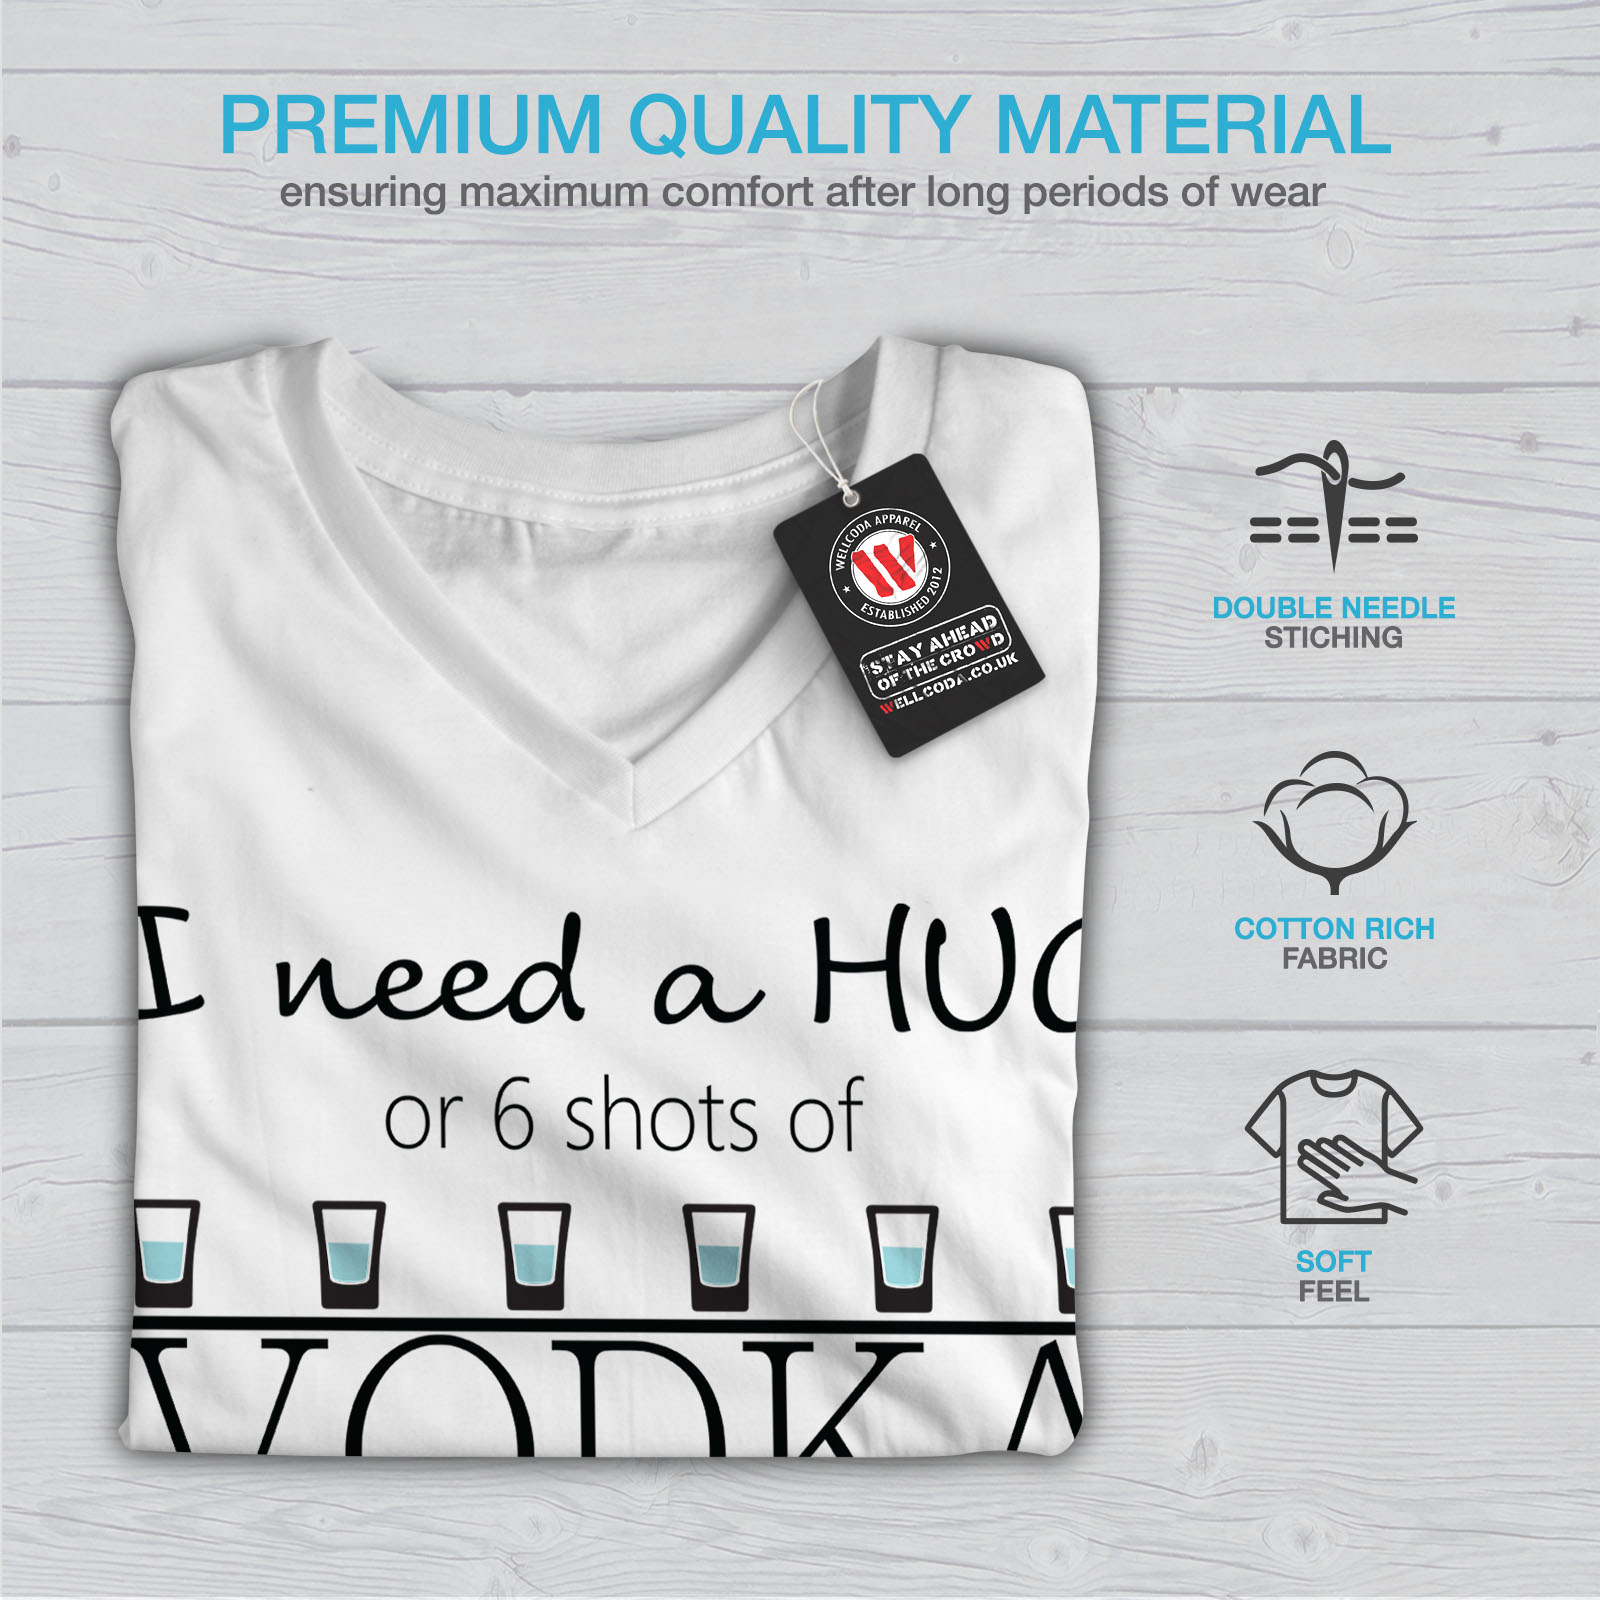 Wellcoda-Calin-ou-haut-femme-Vodka-T-Shirt-col-V-Drole-Citation-Design-Graphique-Tee miniature 9